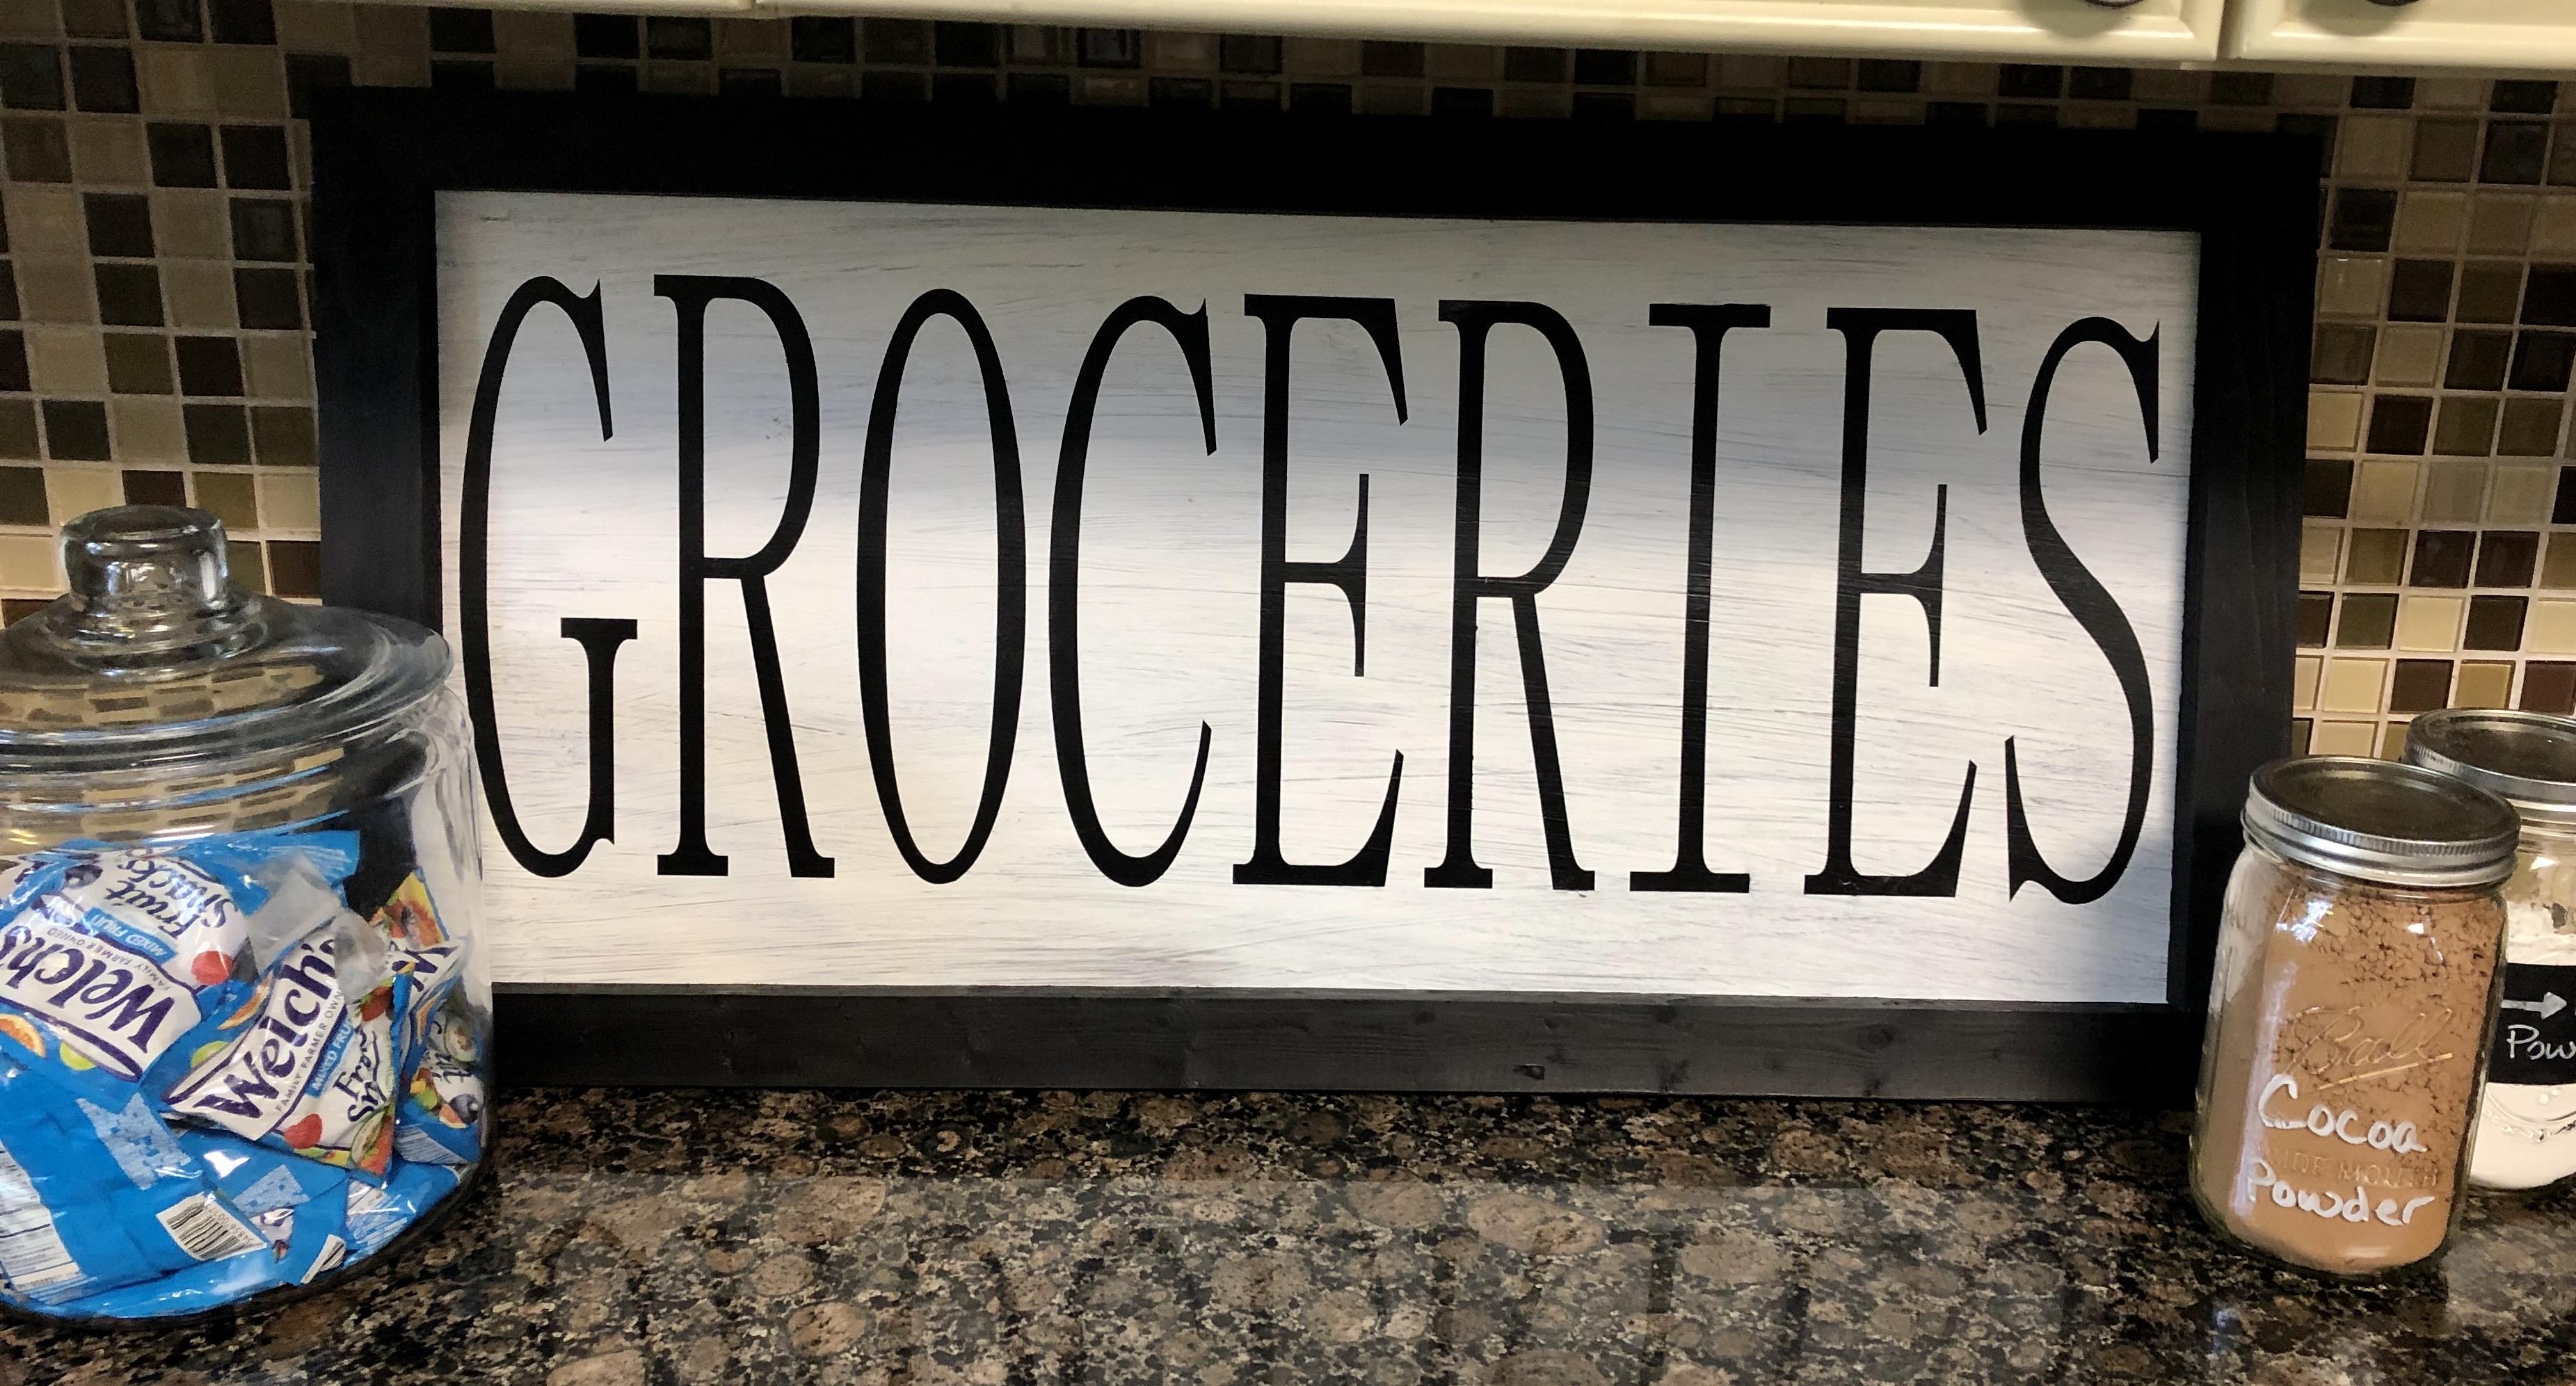 325 Groceries